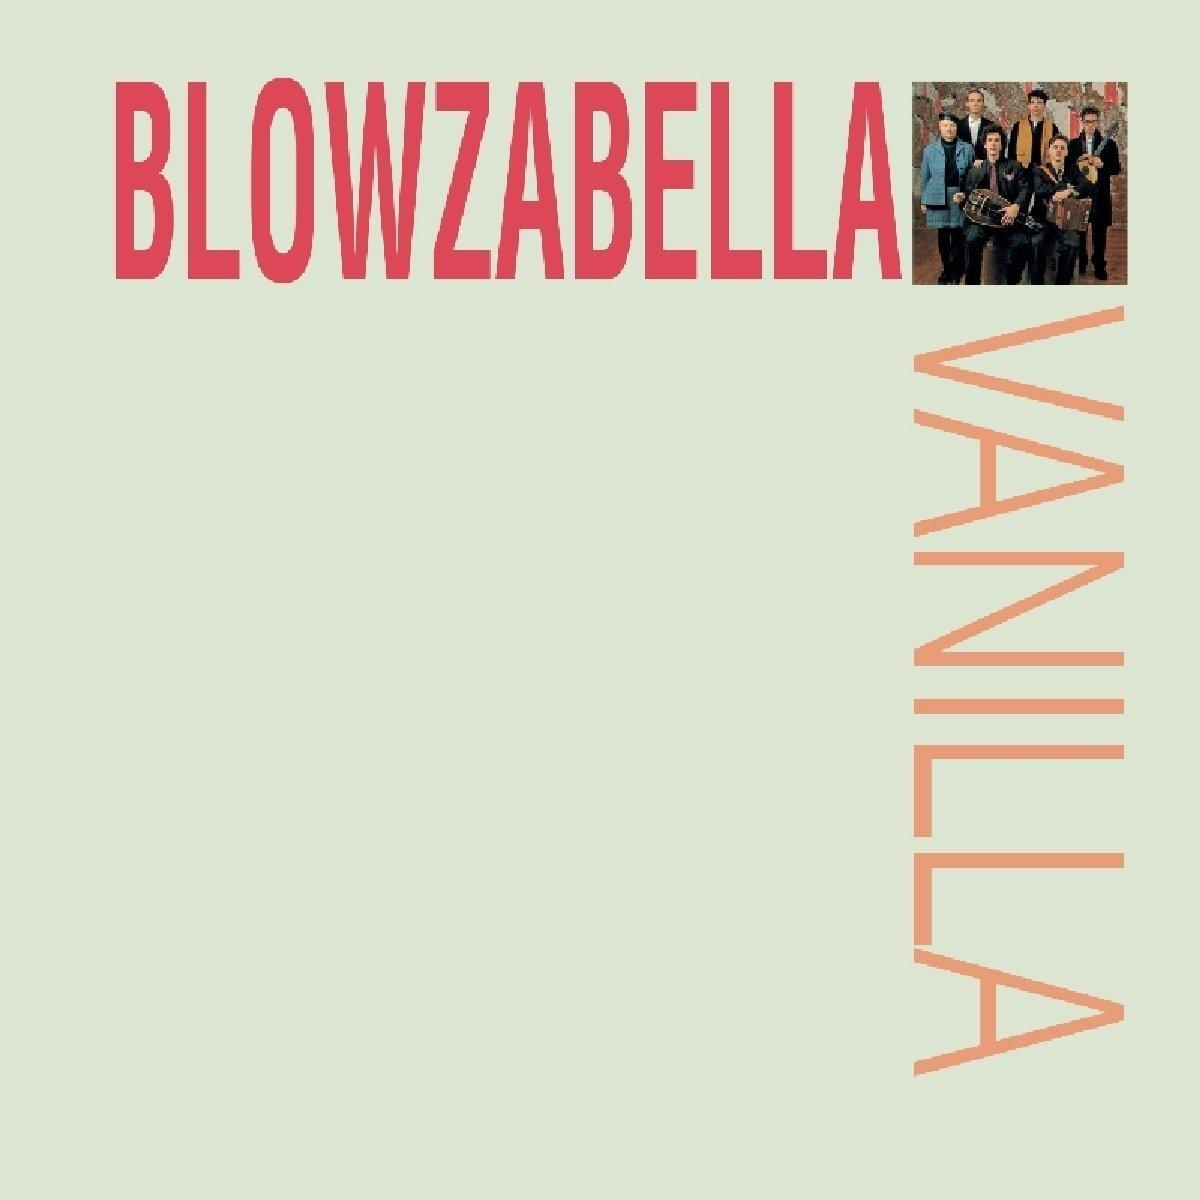 Vanilla by Blowzabella image